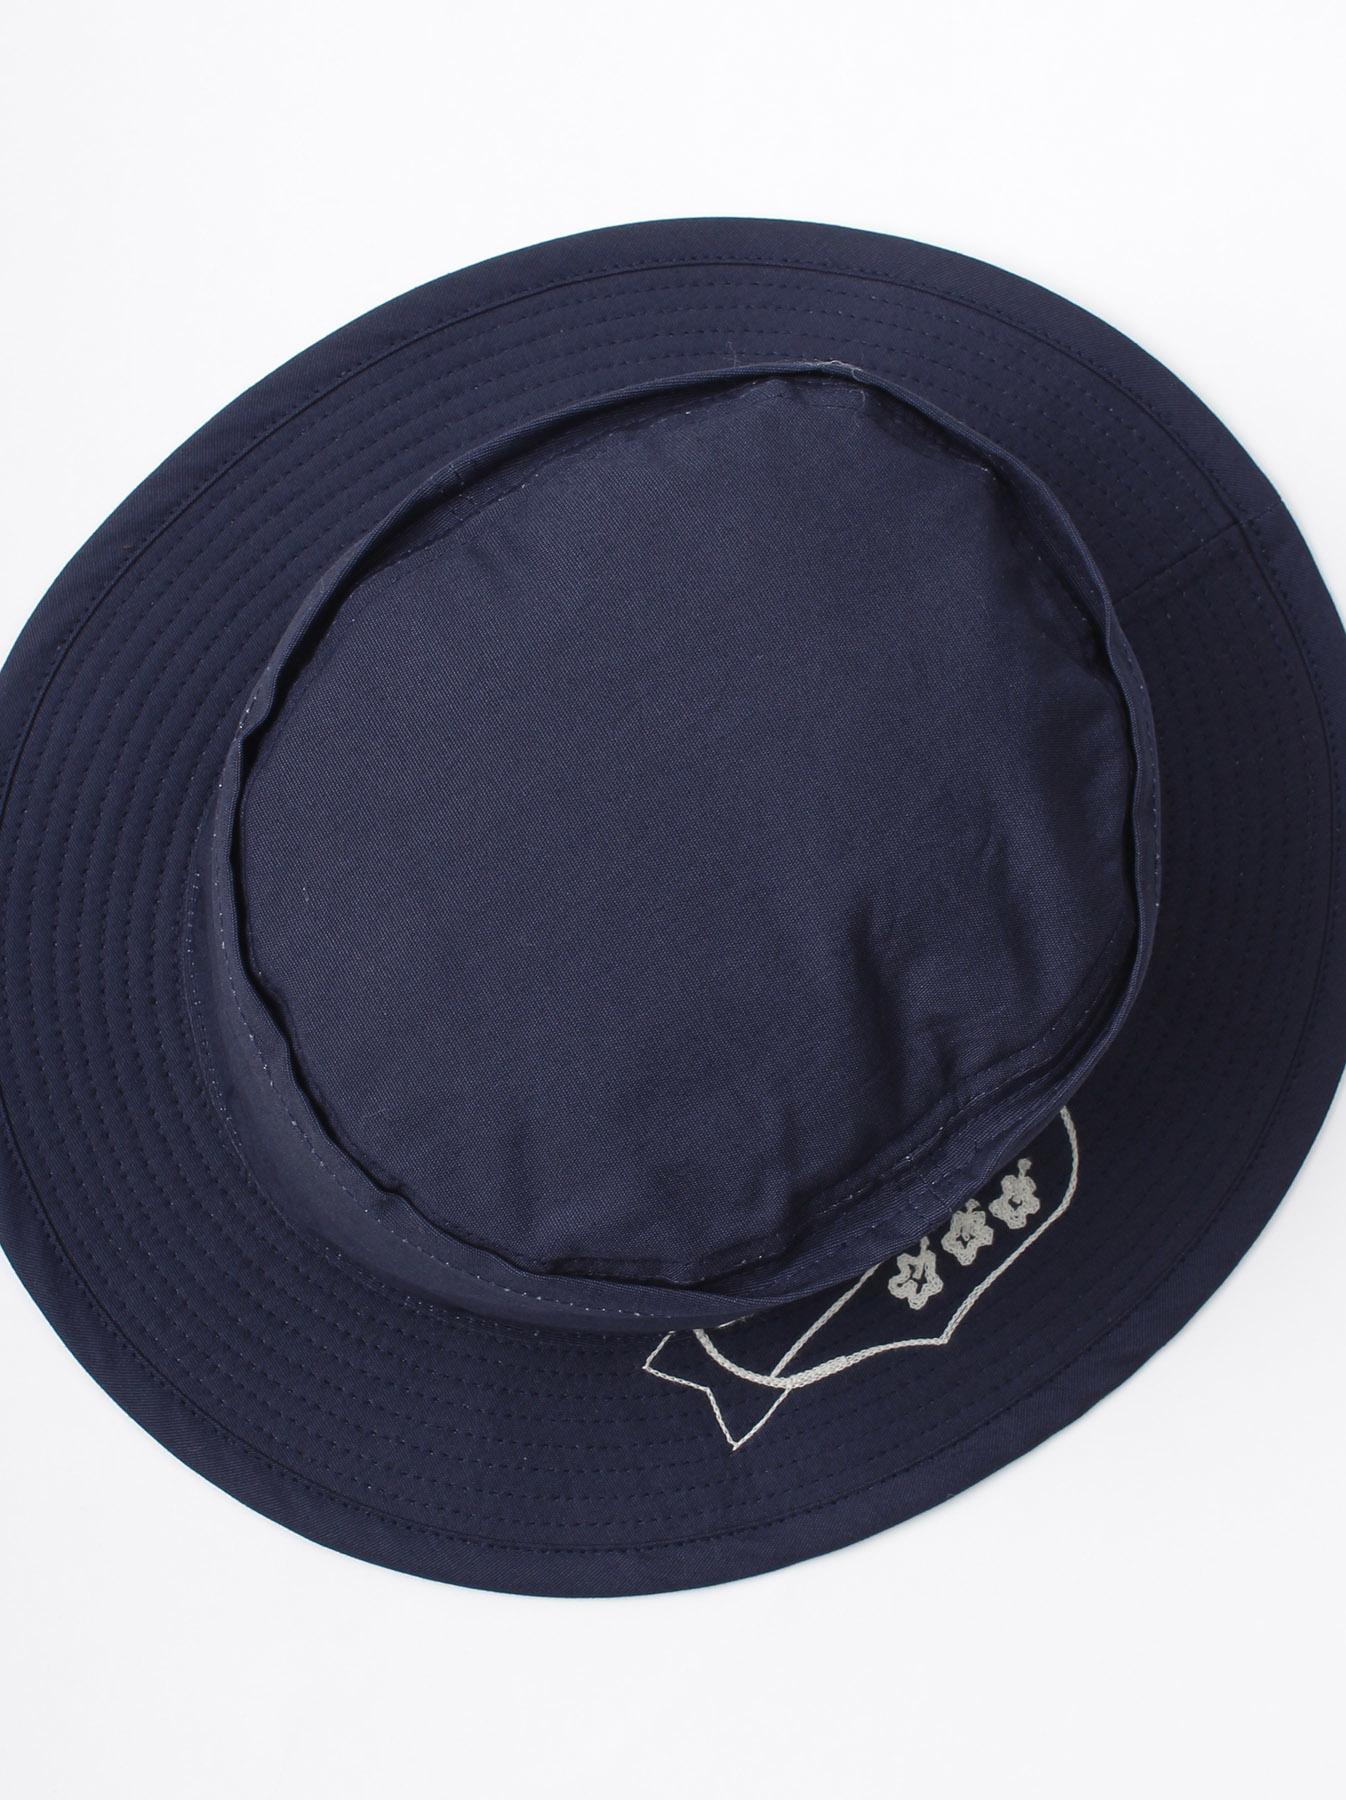 WH Umiiloha Hat-7